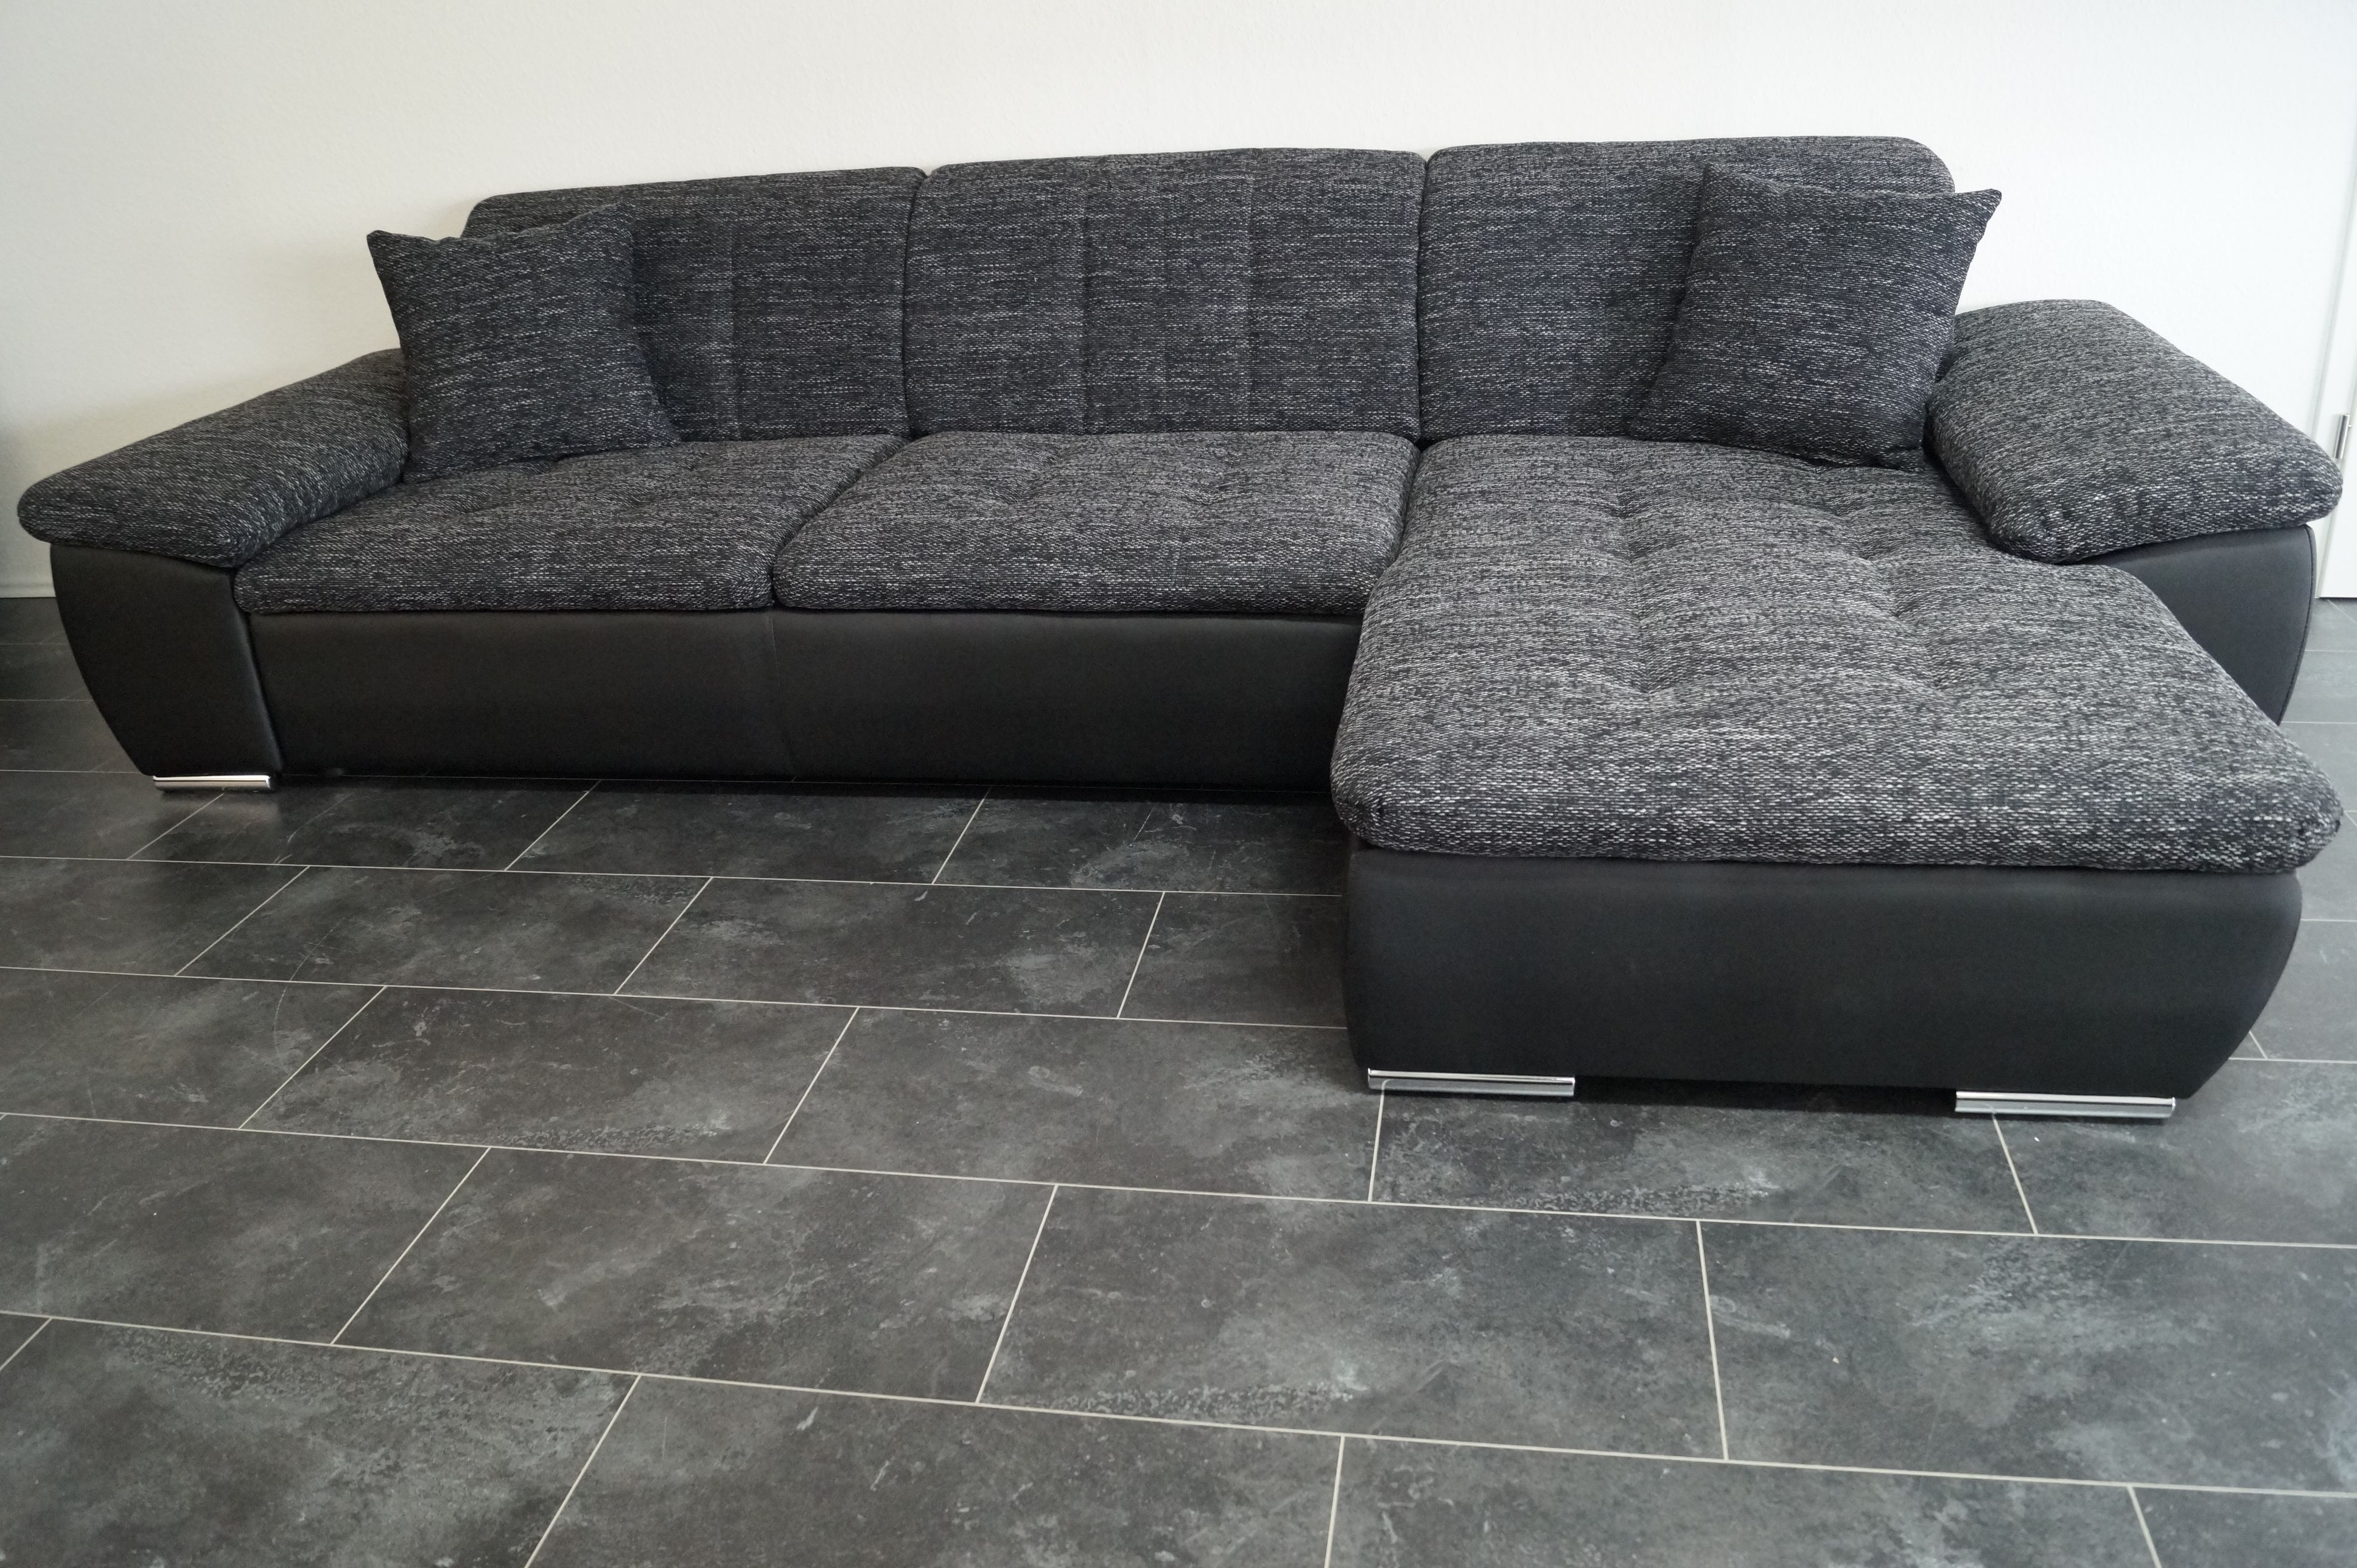 Sofa Lagerverkauf Fabrikverkauf Elkenroth Polste Www Sofa